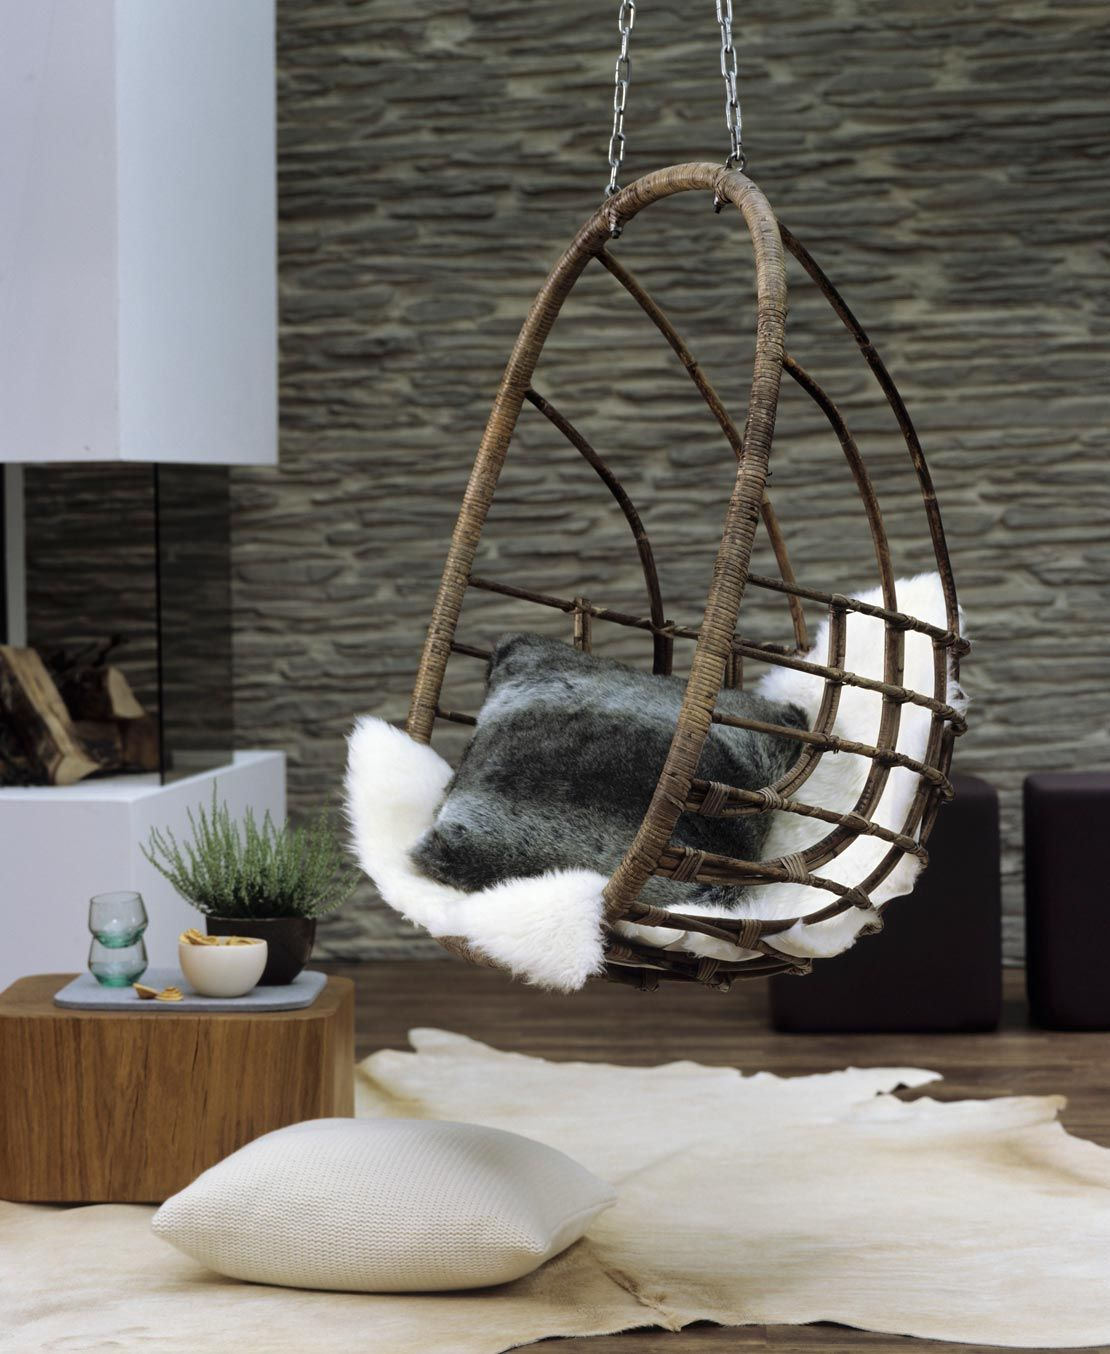 Westwing sillas colgantes madera estilo boho pinterest - Silla colgante ...